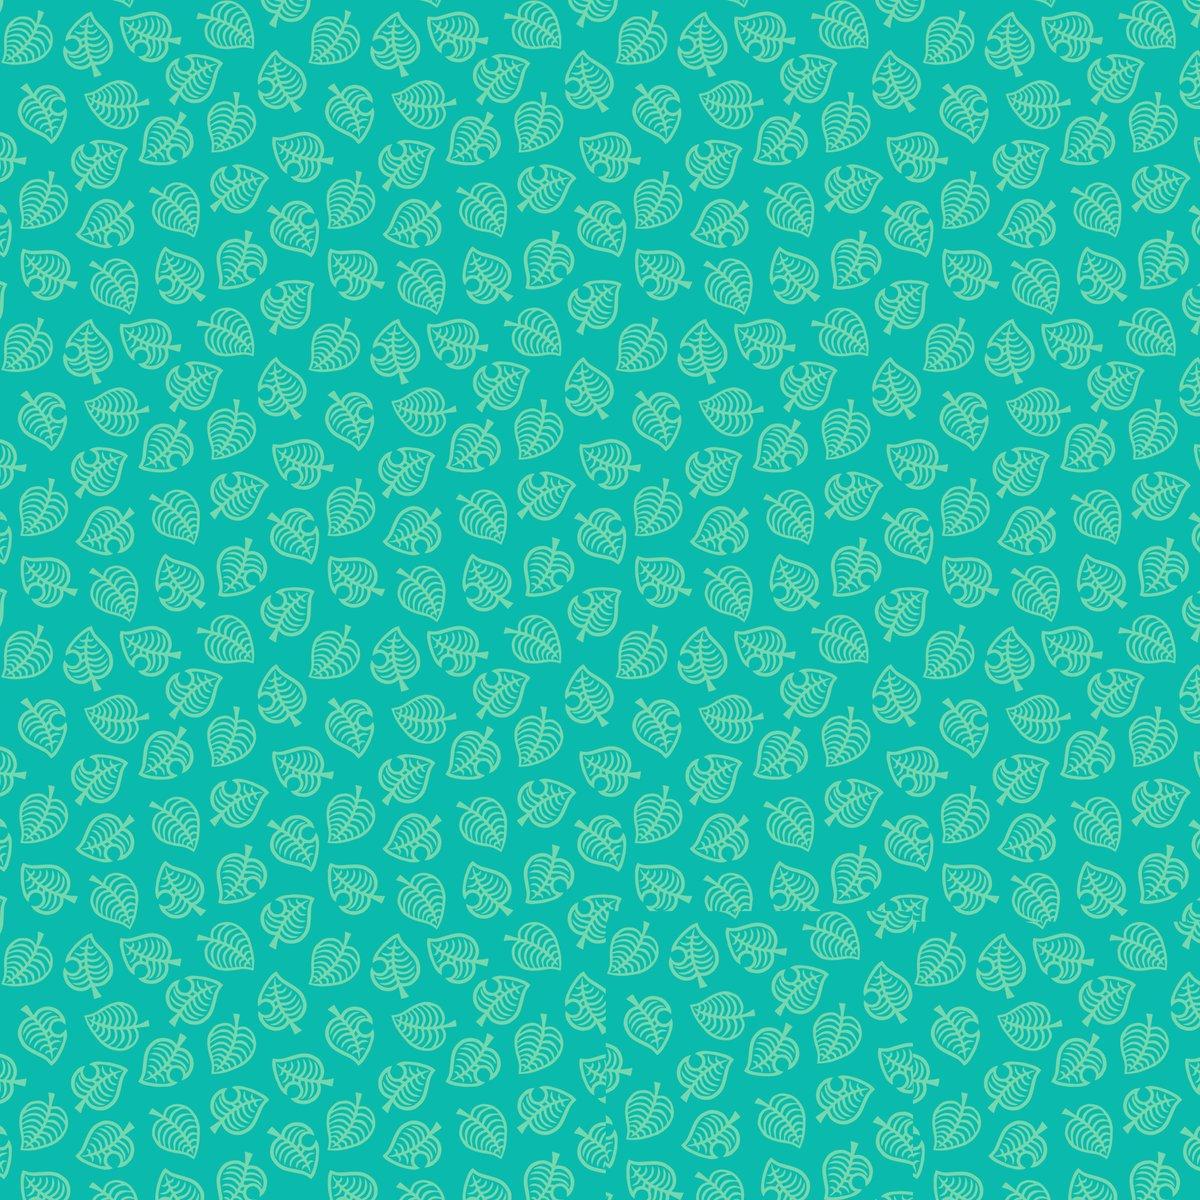 animal crossing new horizons leaf pattern